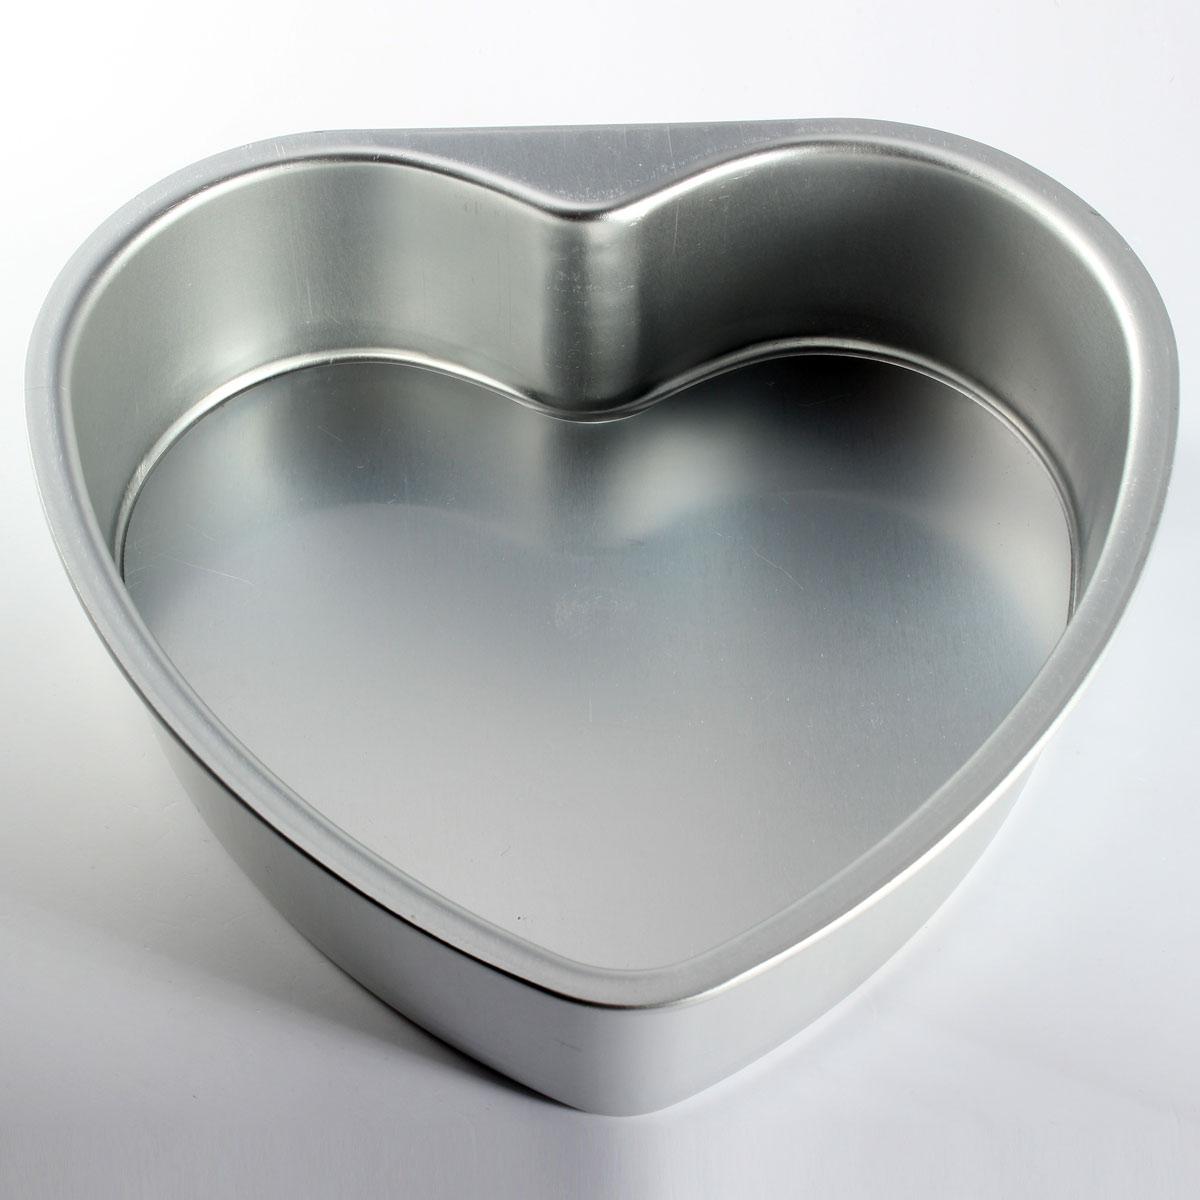 3-10 Inchs Aluminium Heart Fondant Cake Baking Mold Pan Tins Wedding Muffin